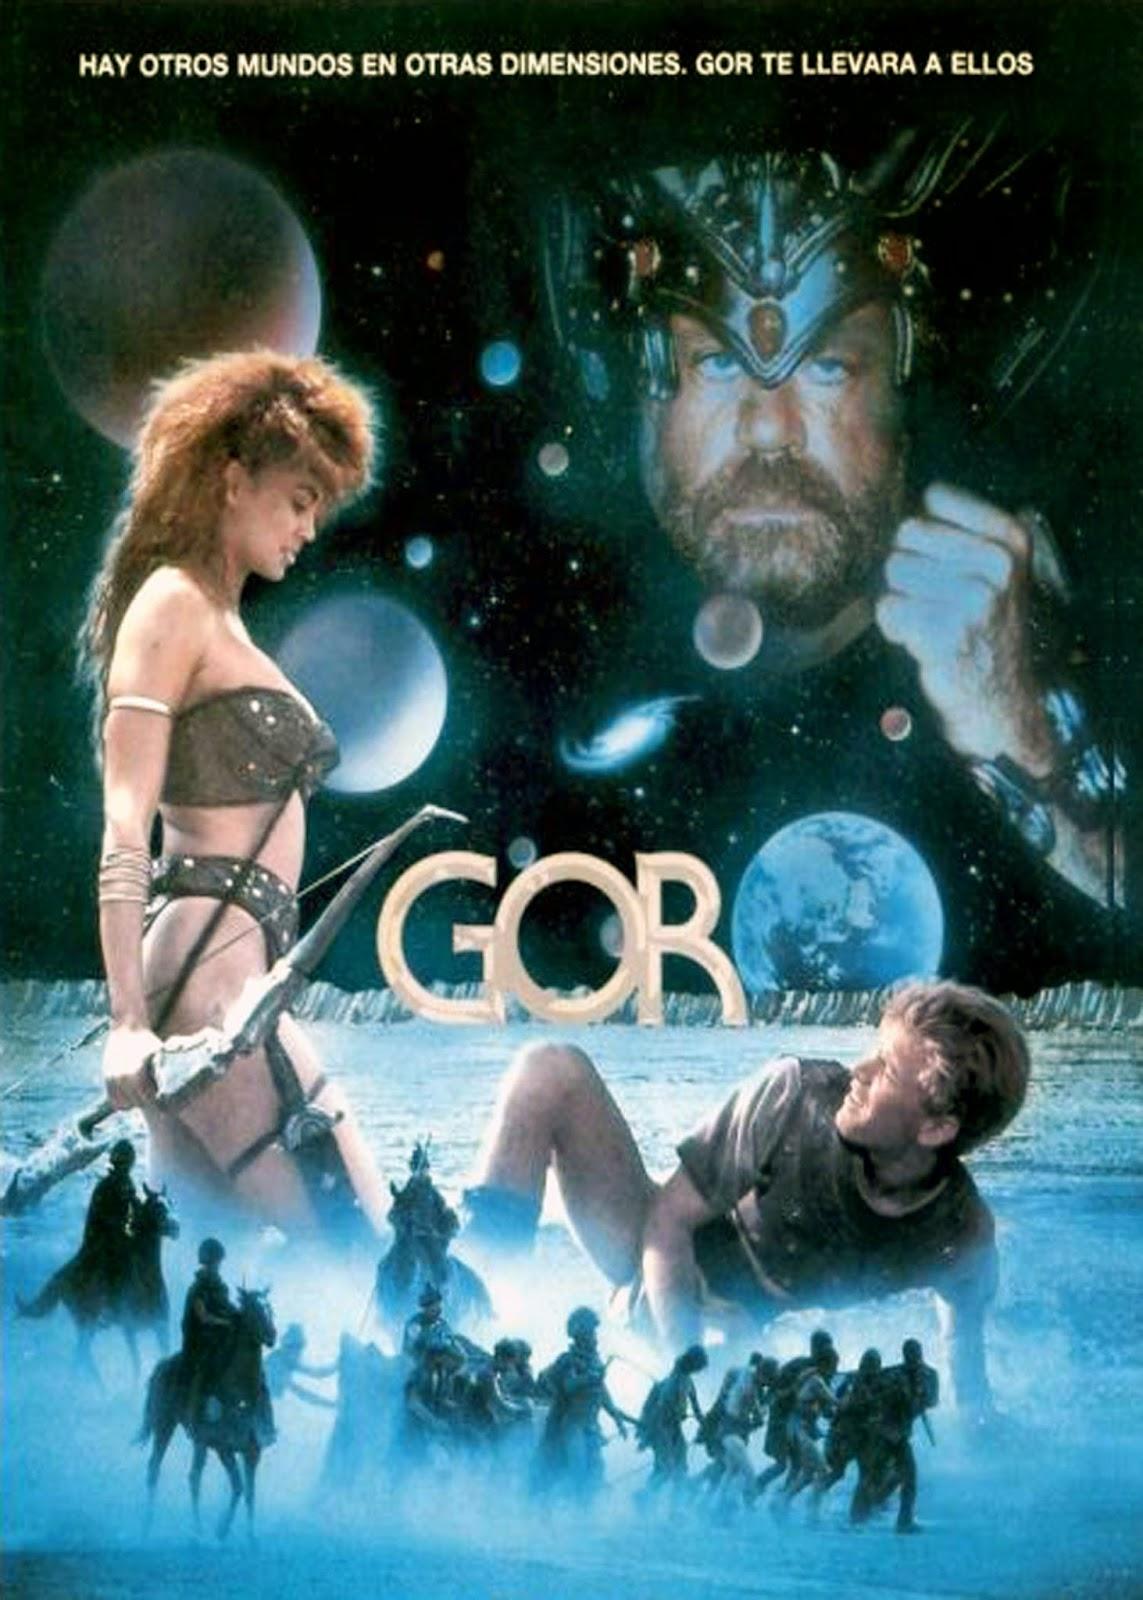 Gor (1988)